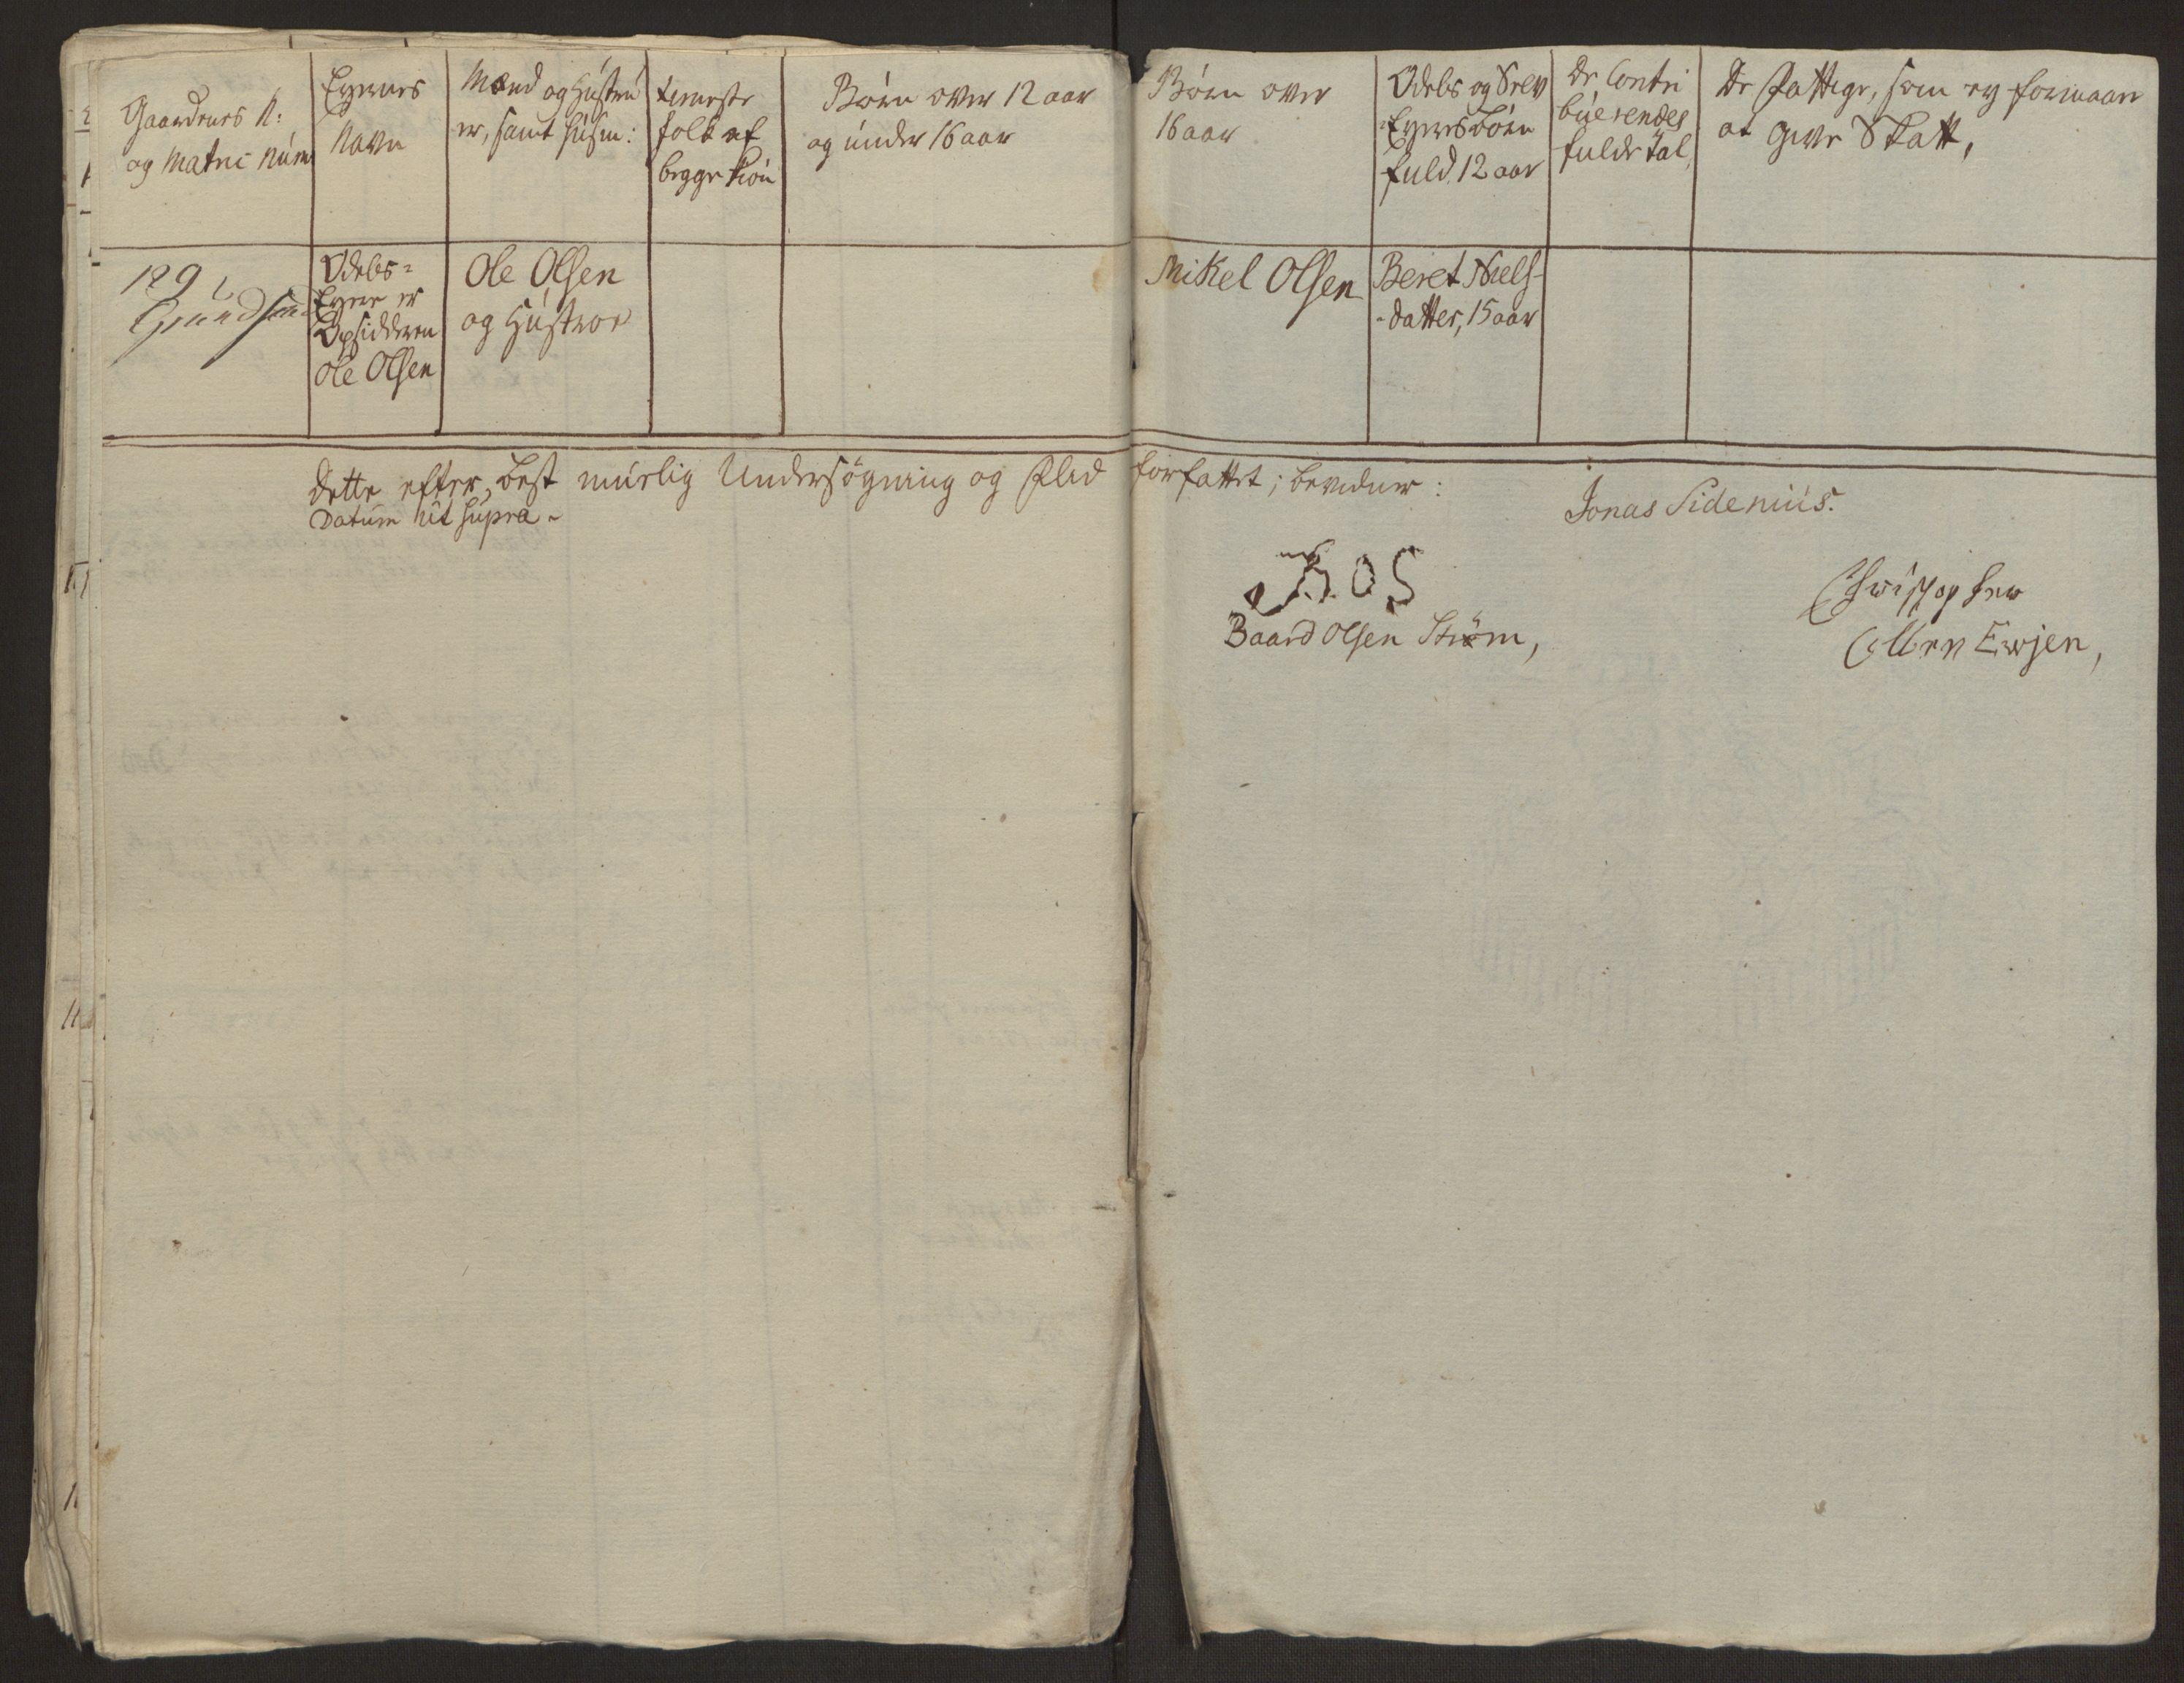 RA, Rentekammeret inntil 1814, Realistisk ordnet avdeling, Ol/L0022a: [Gg 10]: Ekstraskatten, 23.09.1762. Nordlands amt, 1763-1769, s. 226